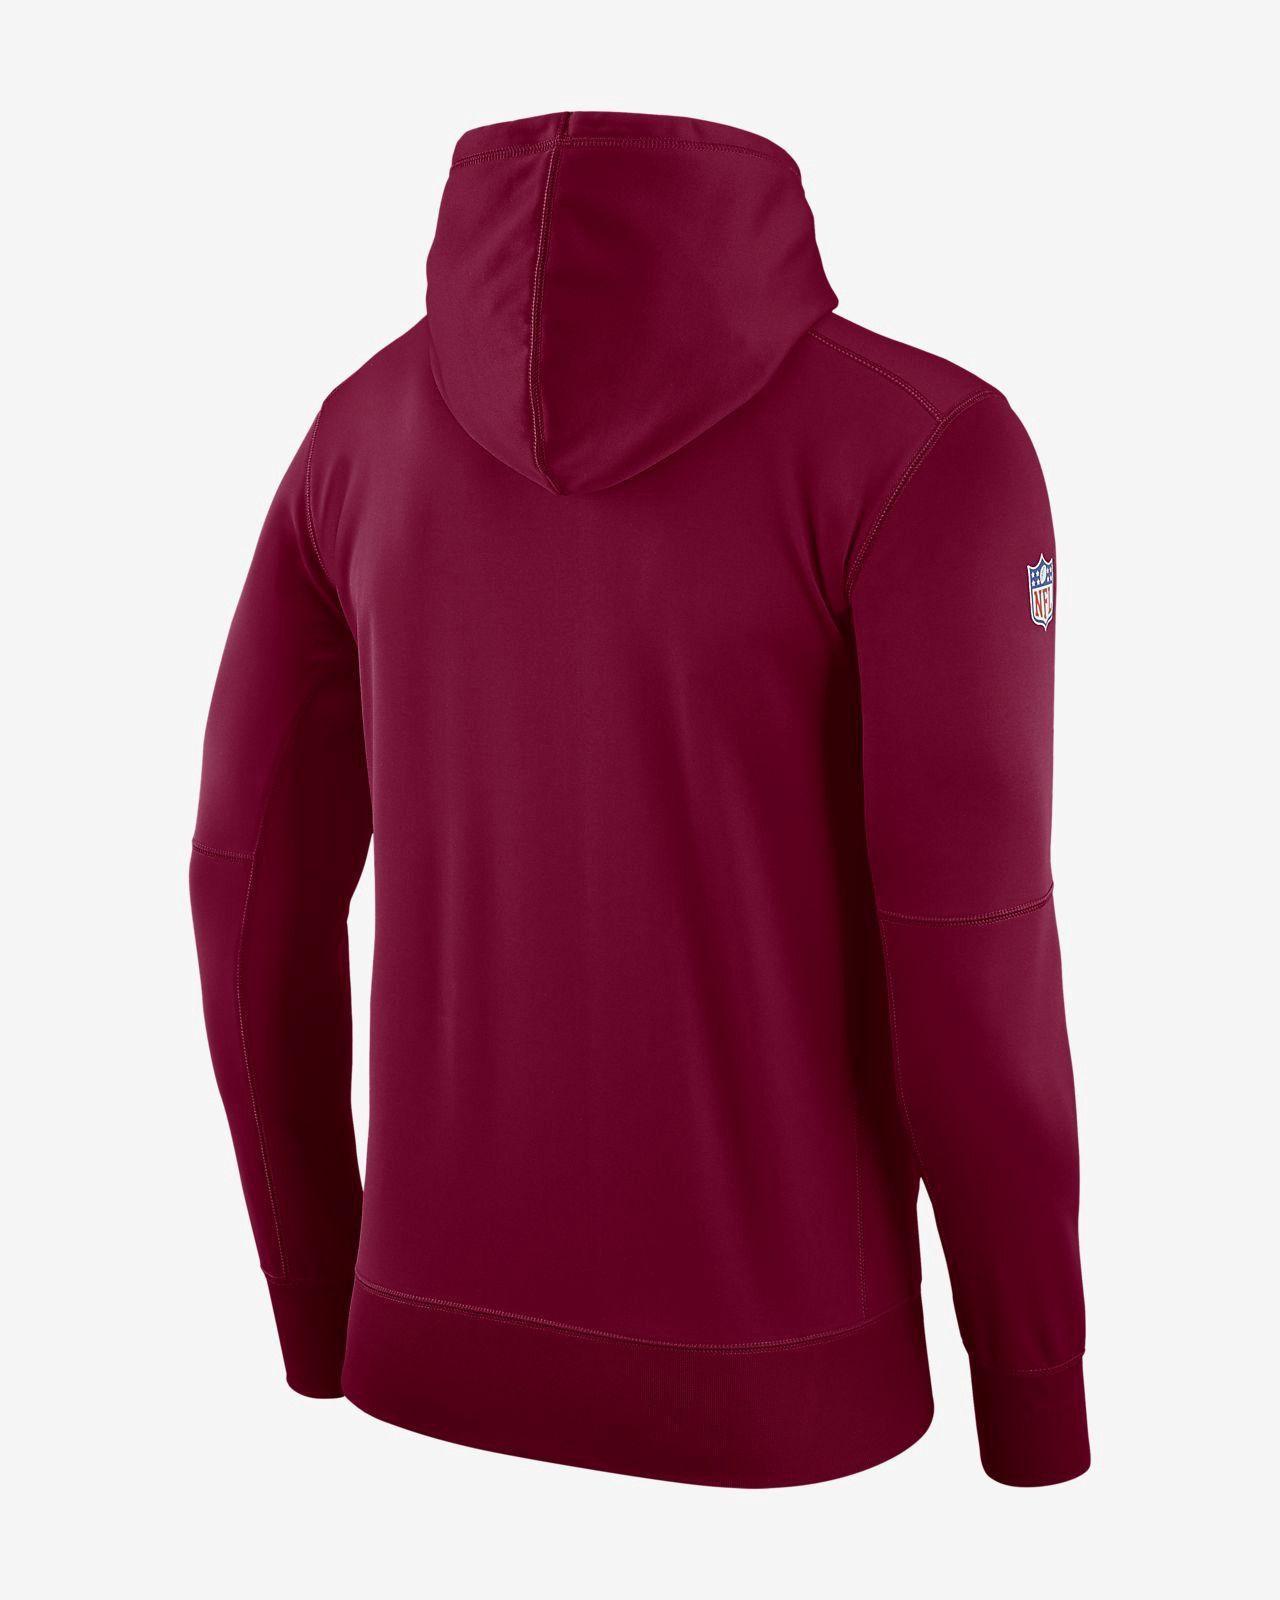 wholesale dealer c4fe2 b8d44 Nike Dri-Fit Therma (Nfl Redskins) Men's Pullover Hoodie ...